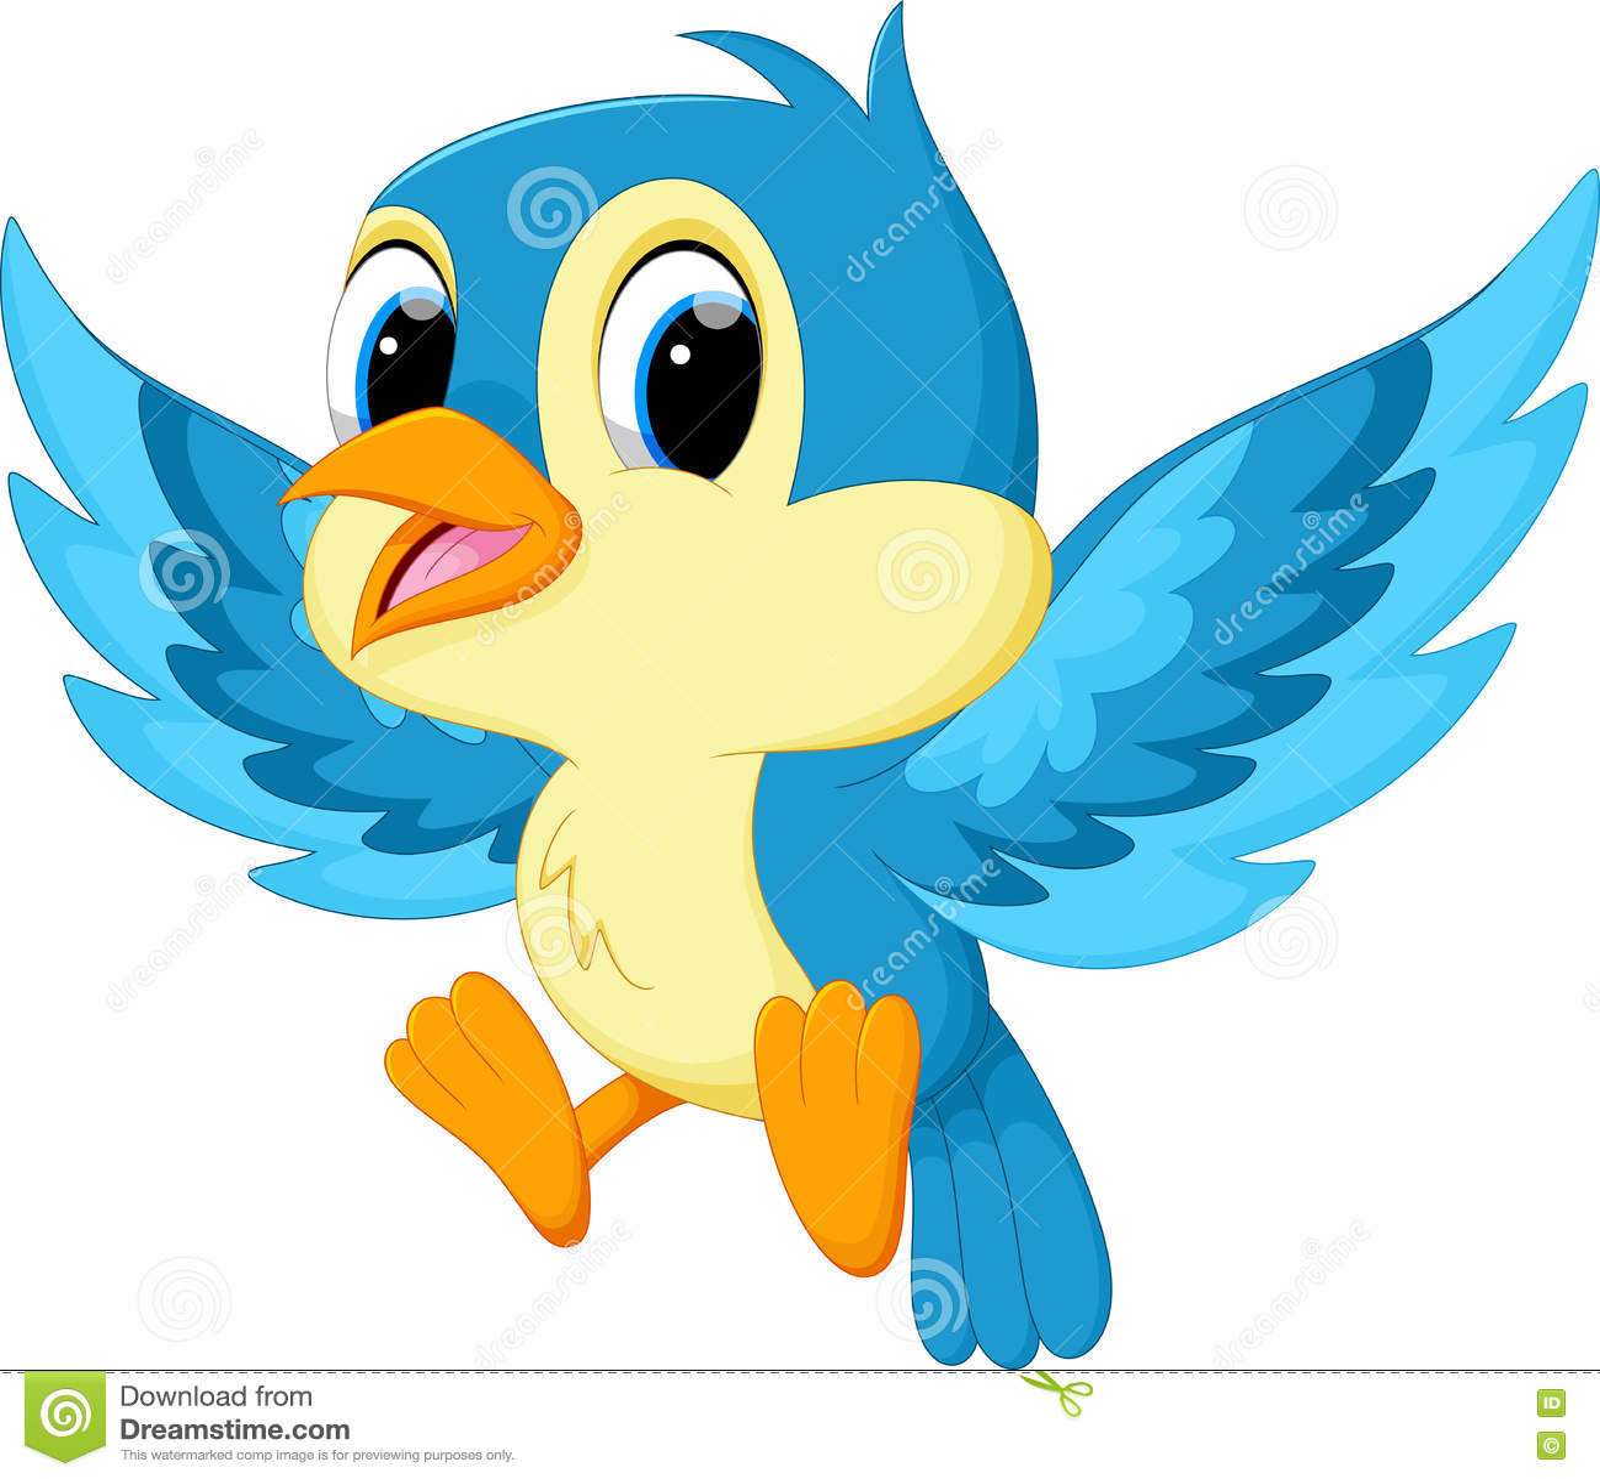 Desenhos Animados Azuis Bonitos Do Passaro Ilustracao Stock Ilustracao De Bonitos Desenhos 79398340